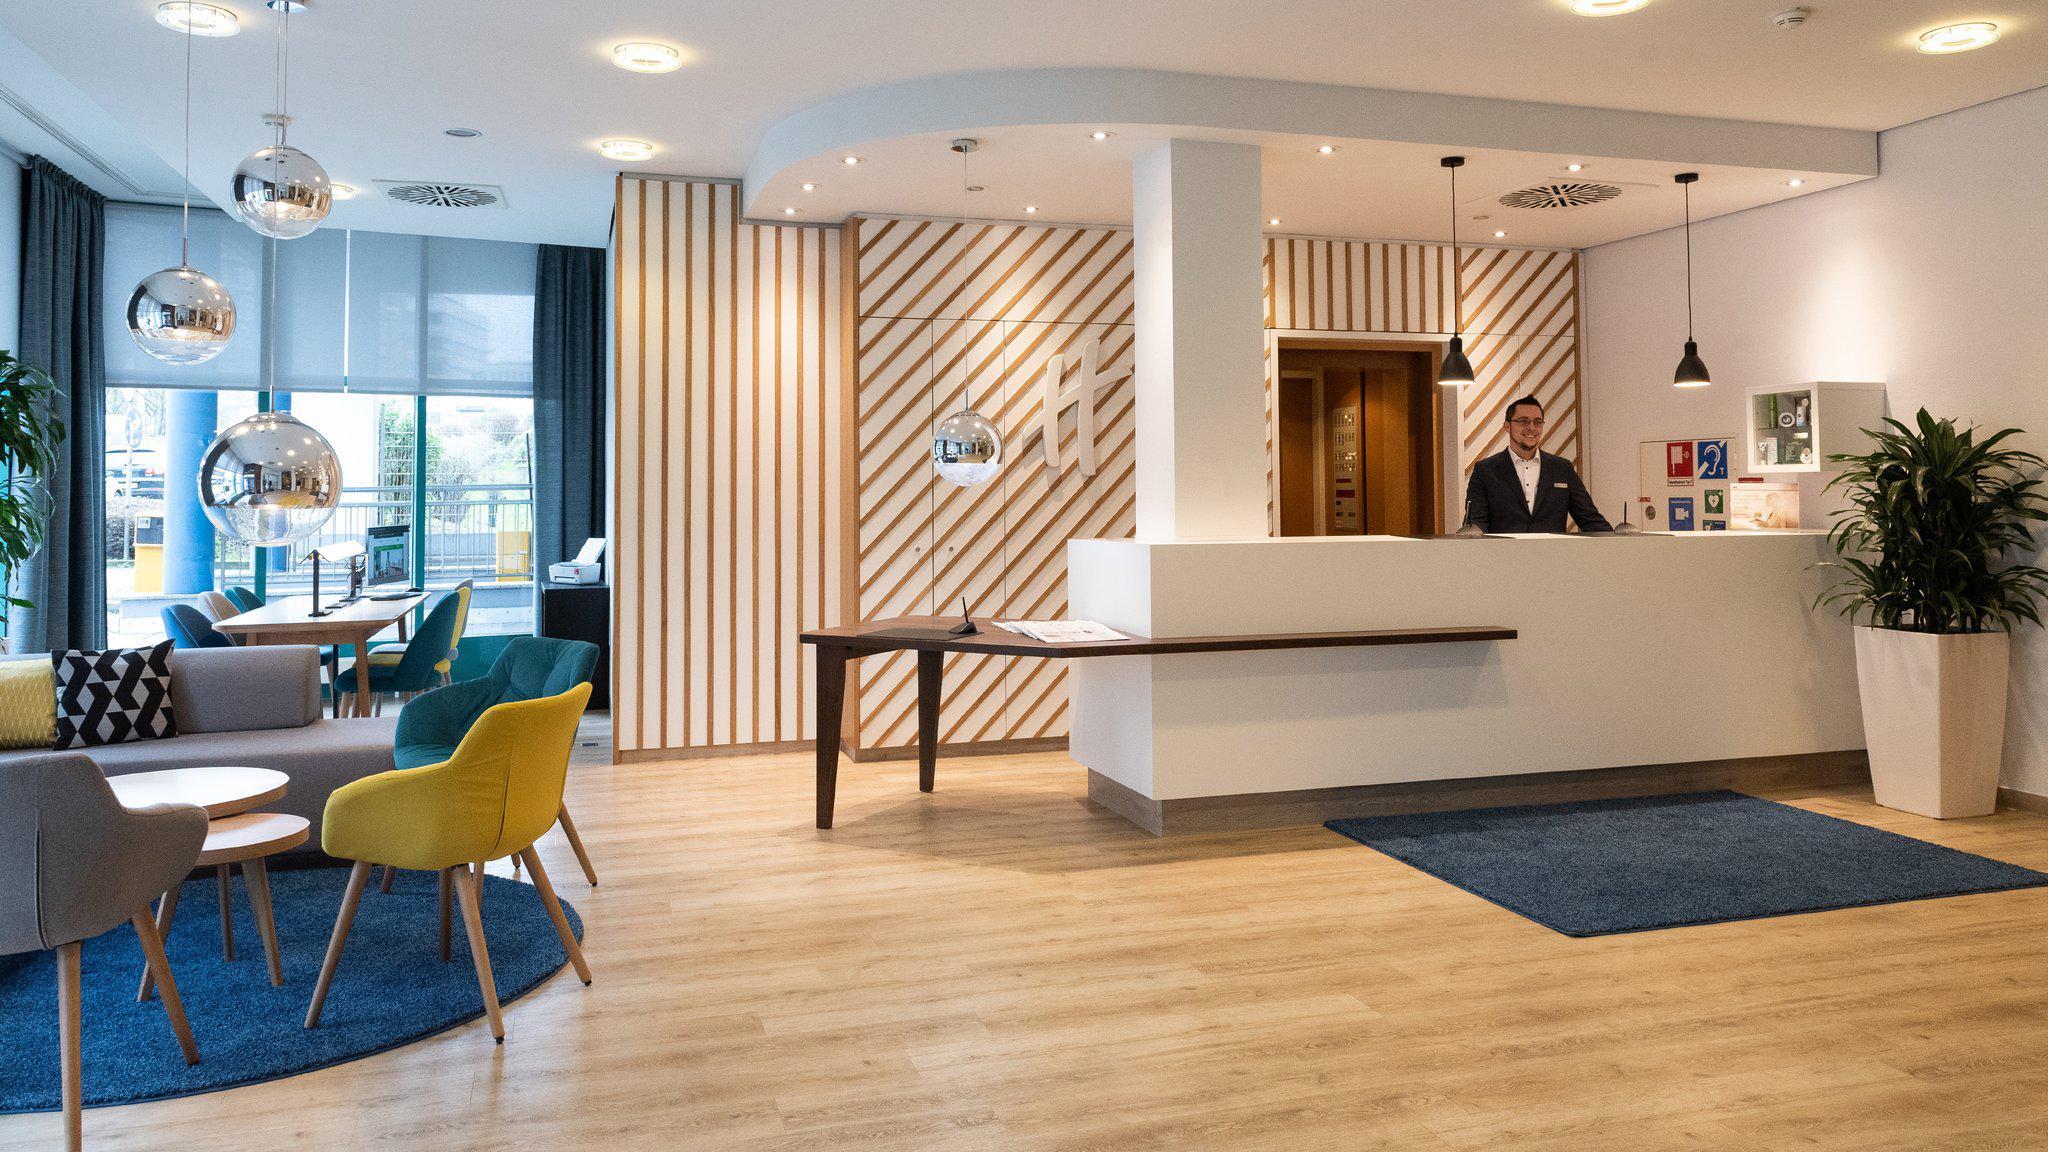 Holiday Inn Essen - City Centre, an IHG Hotel